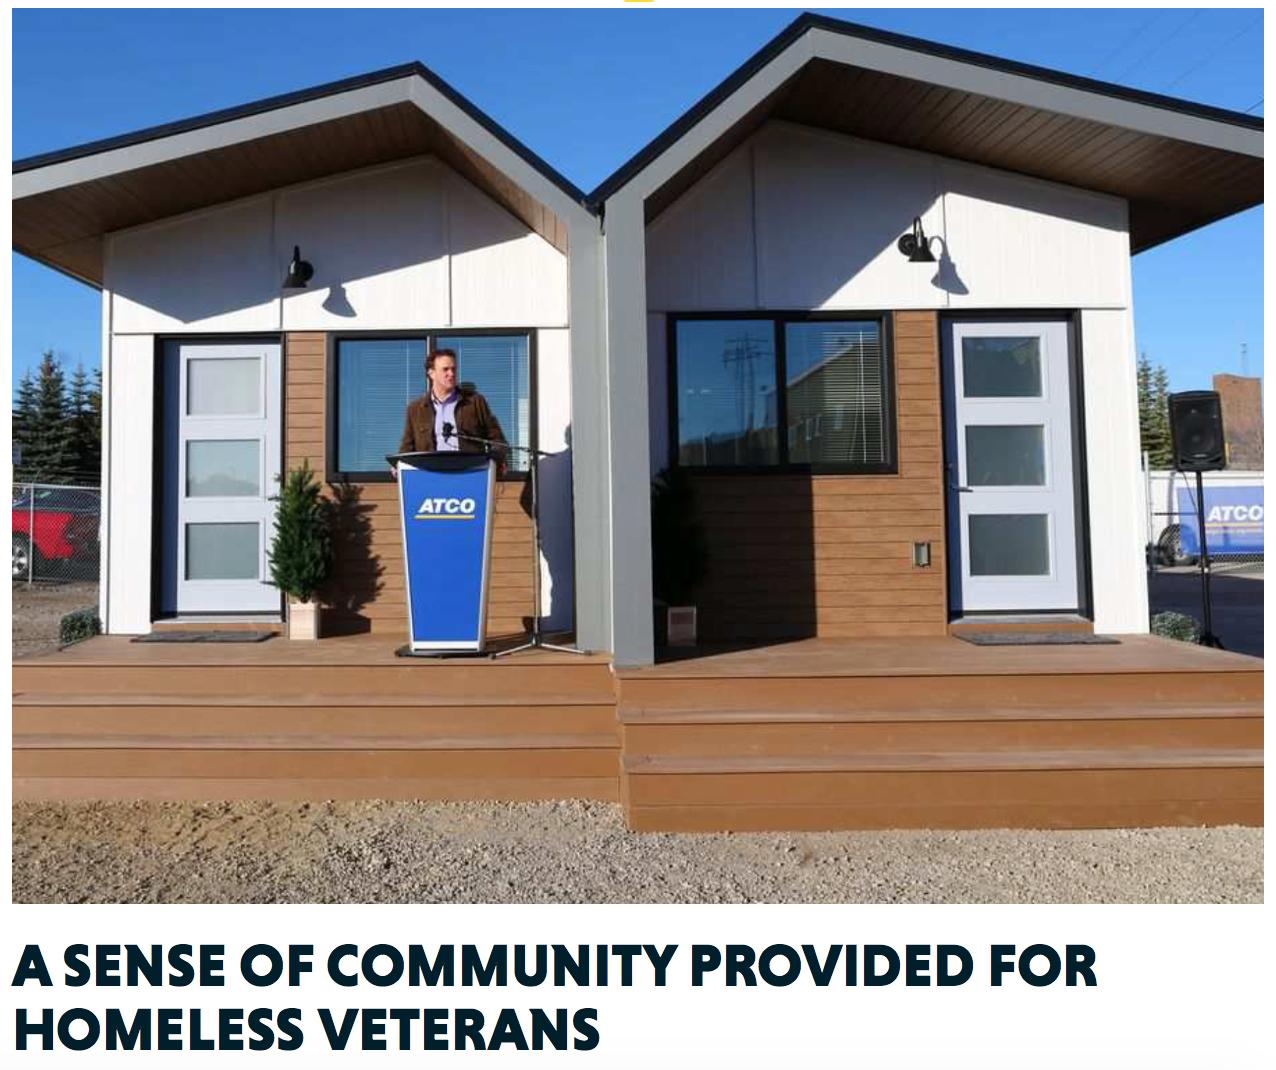 Sense Of Community For Vets Tiny House House Blueprints Tiny House Trailer